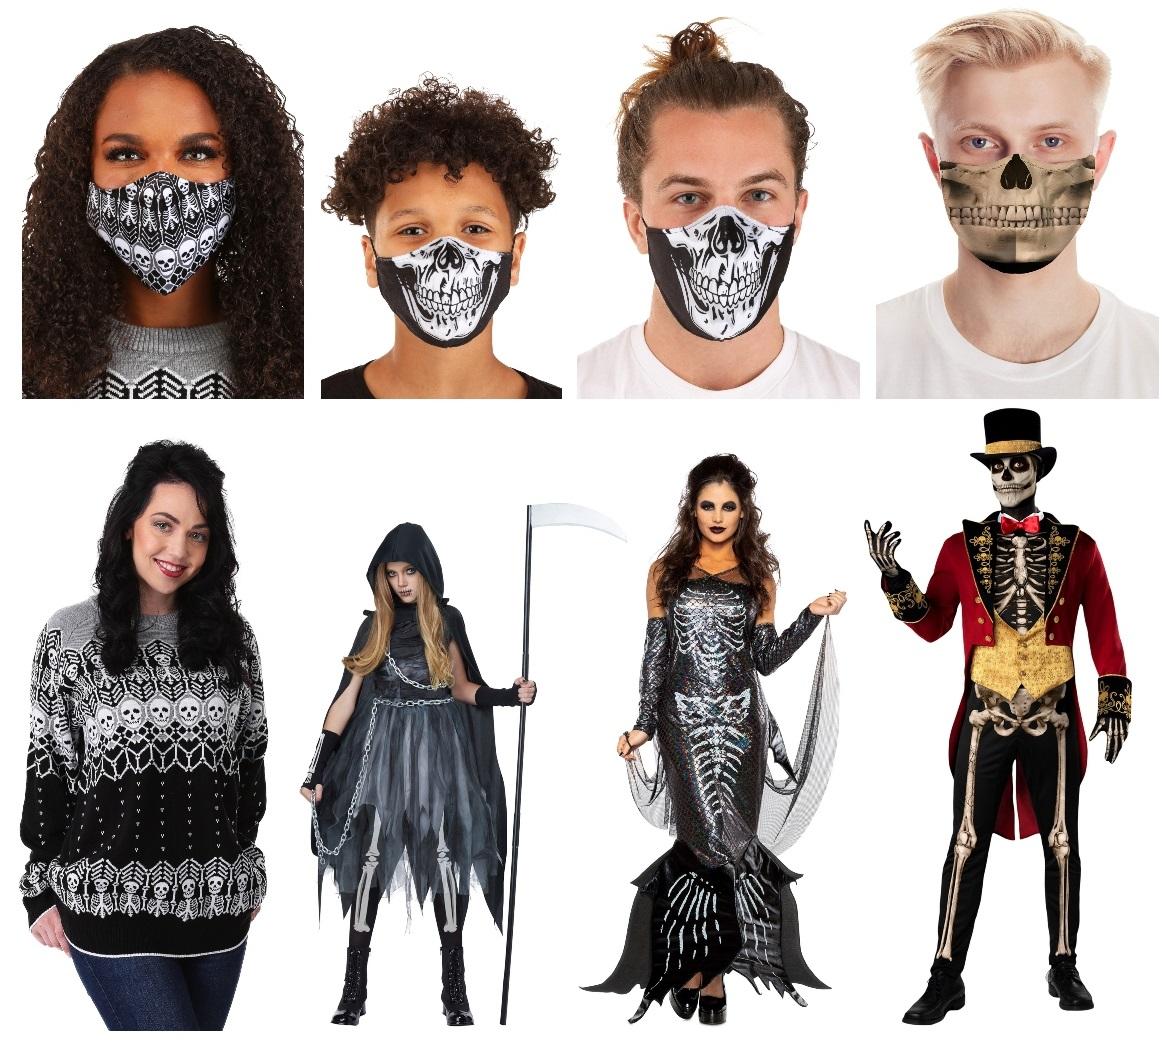 Skeleton Masks and Costumes